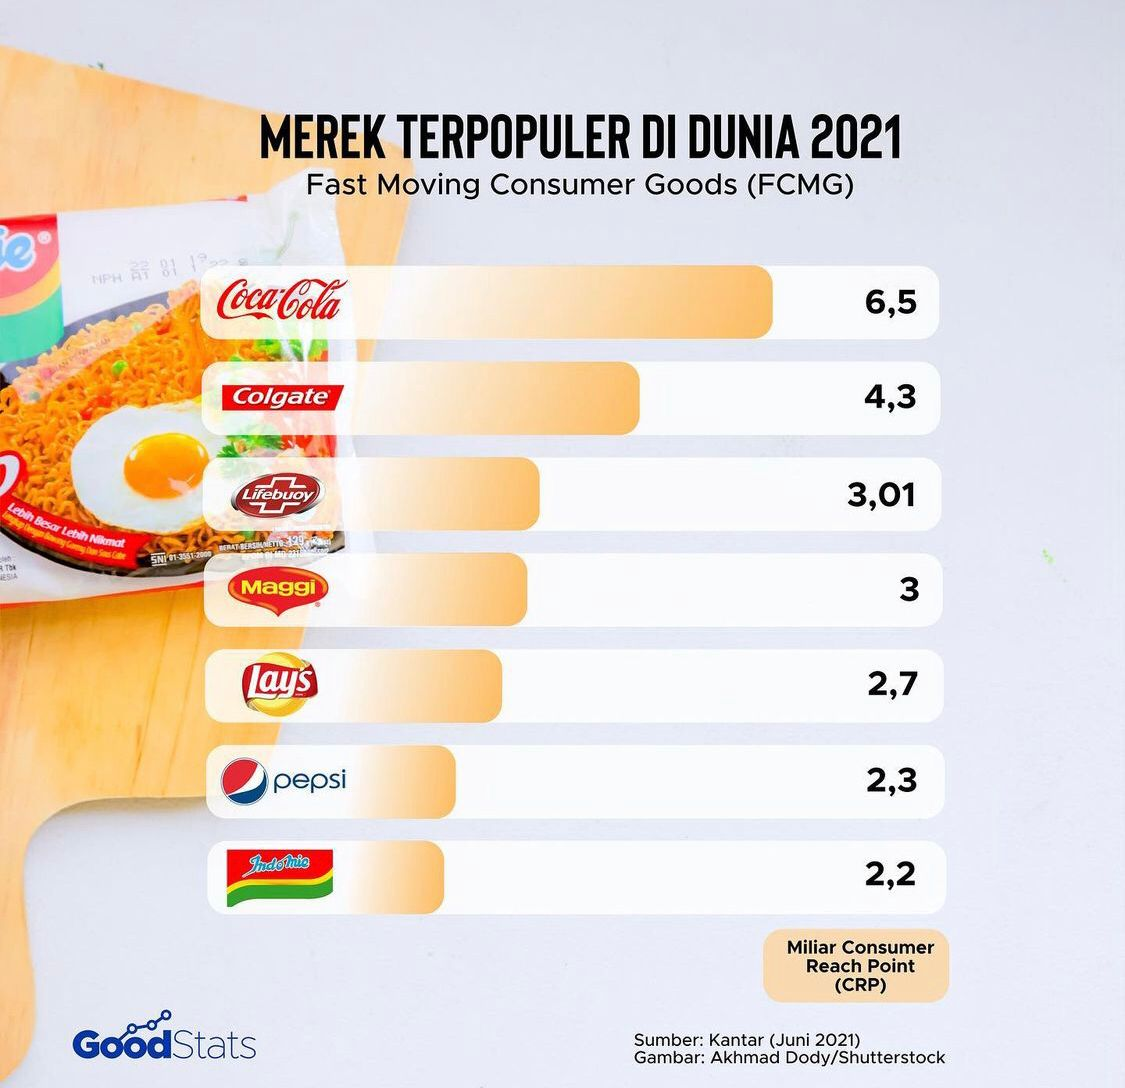 Merek fast moving consumer goods terpopuler 2021 | GoodStats